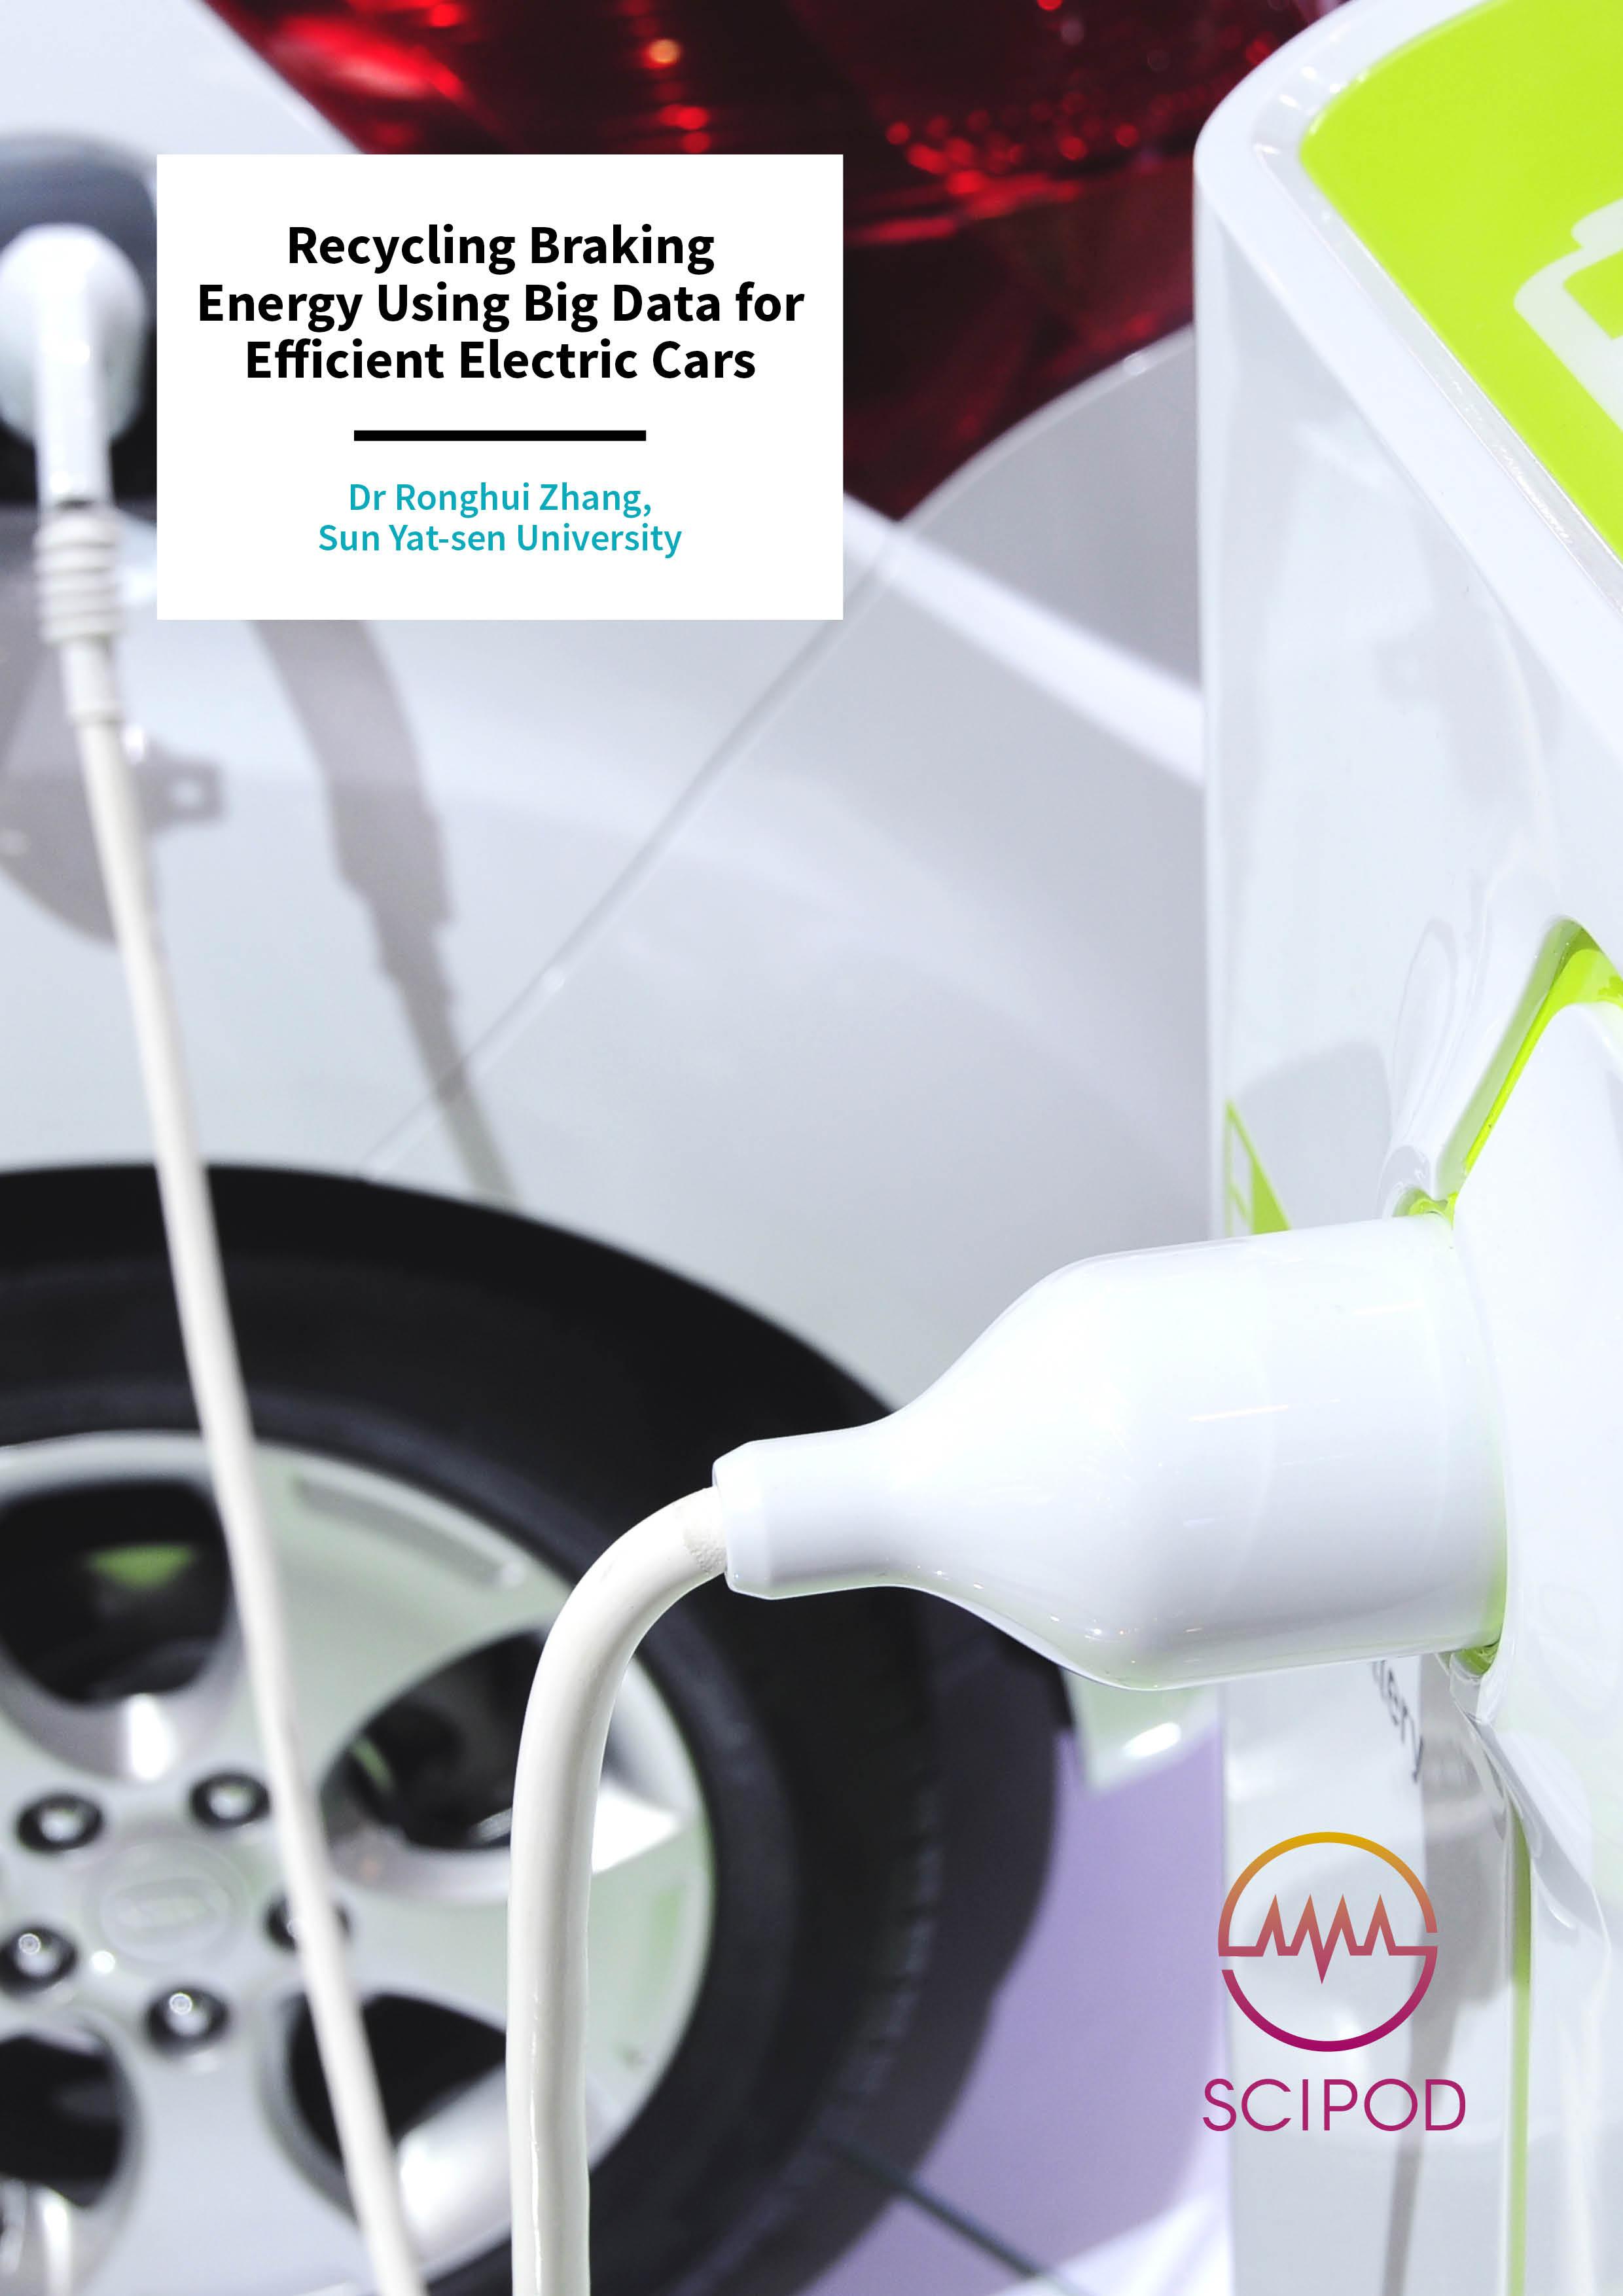 Recycling Braking Energy Using Big Data for Efficient Electric Cars – Dr Ronghui Zhang, Sun Yat-sen University